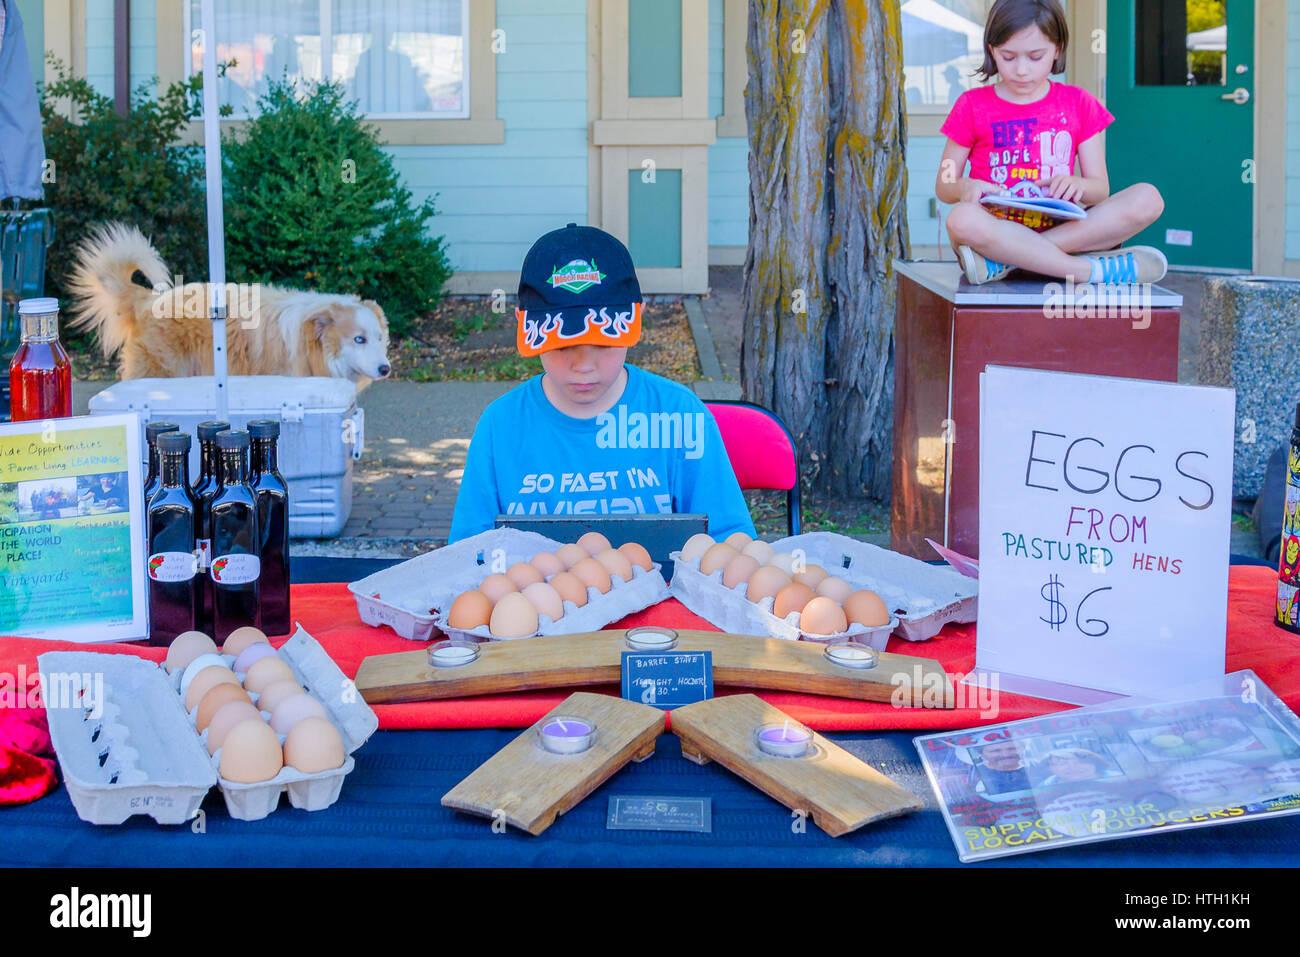 Eggs for sale at Farmers Market, Lytton, British Columbia, Canada Stock Photo